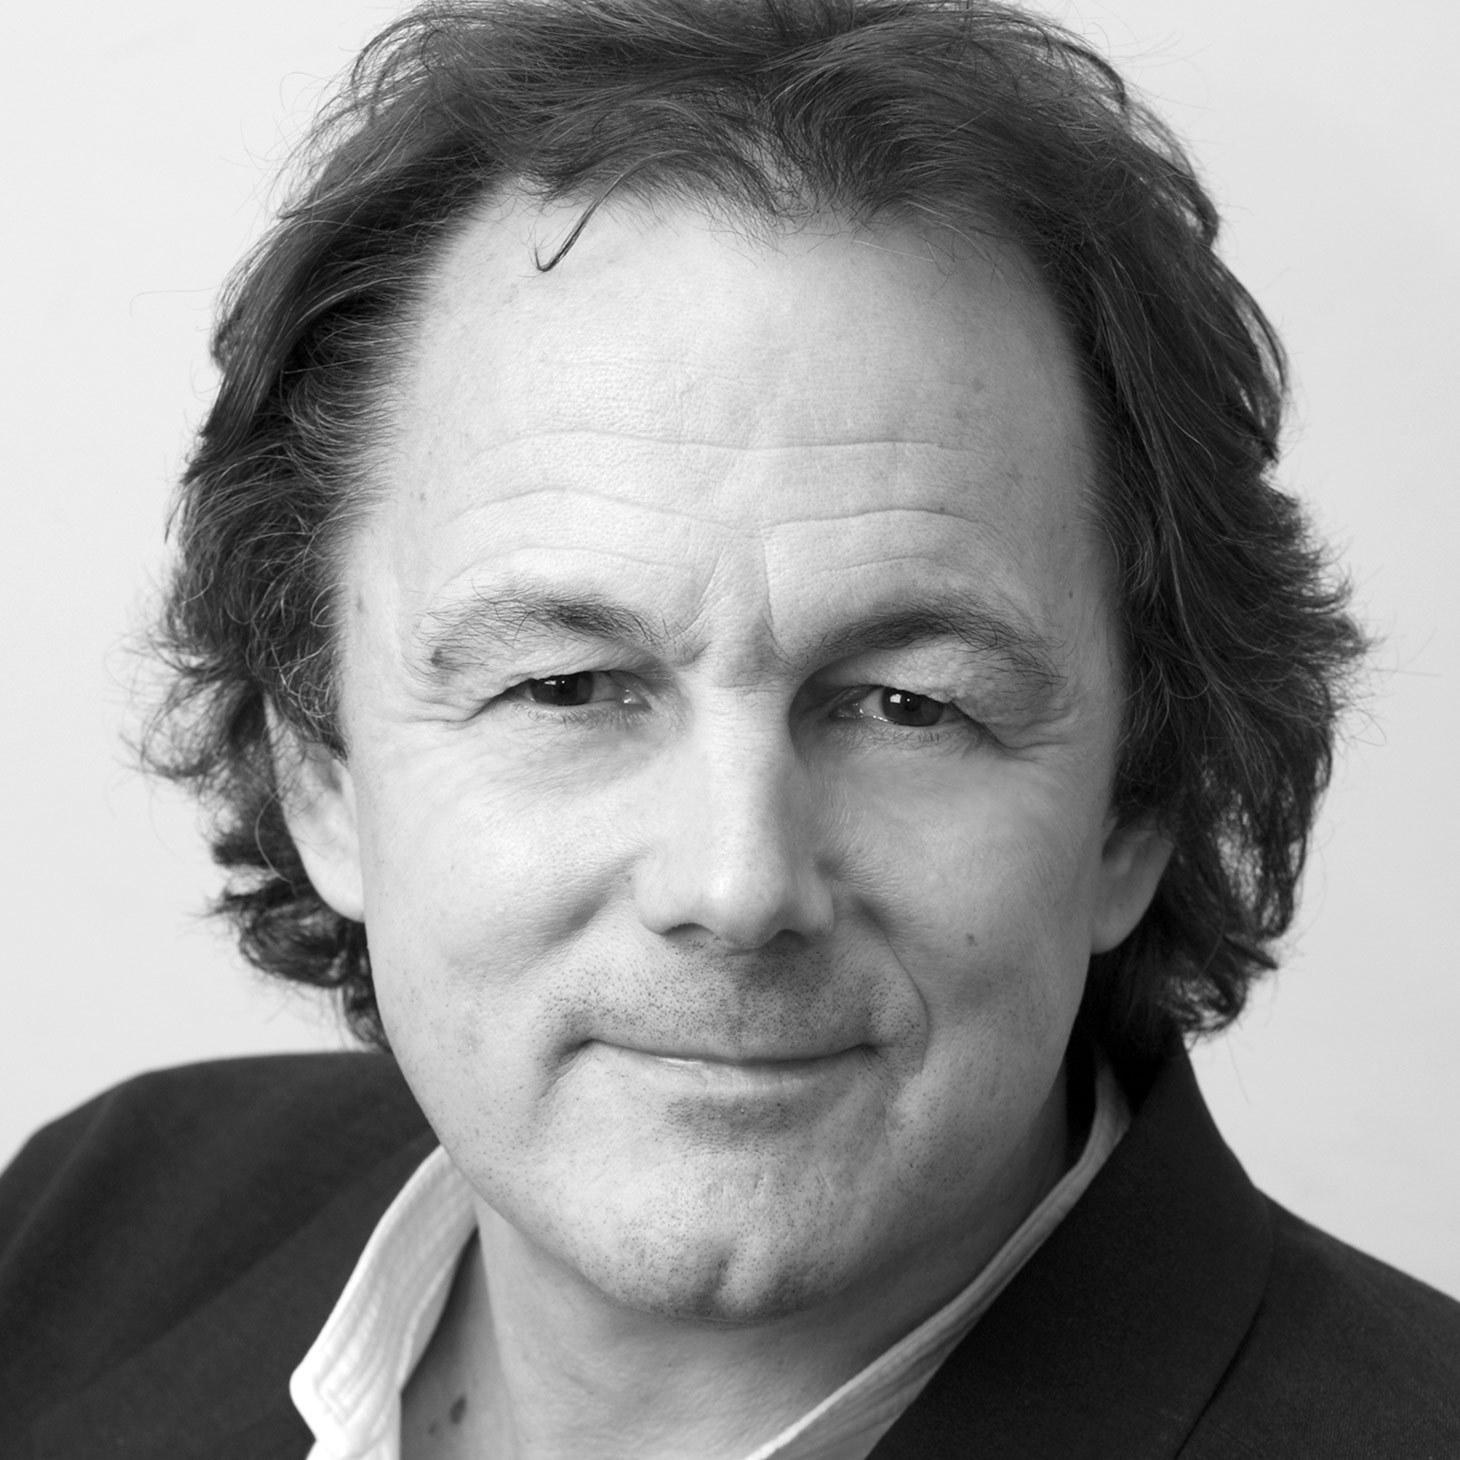 Paul Williams OBE